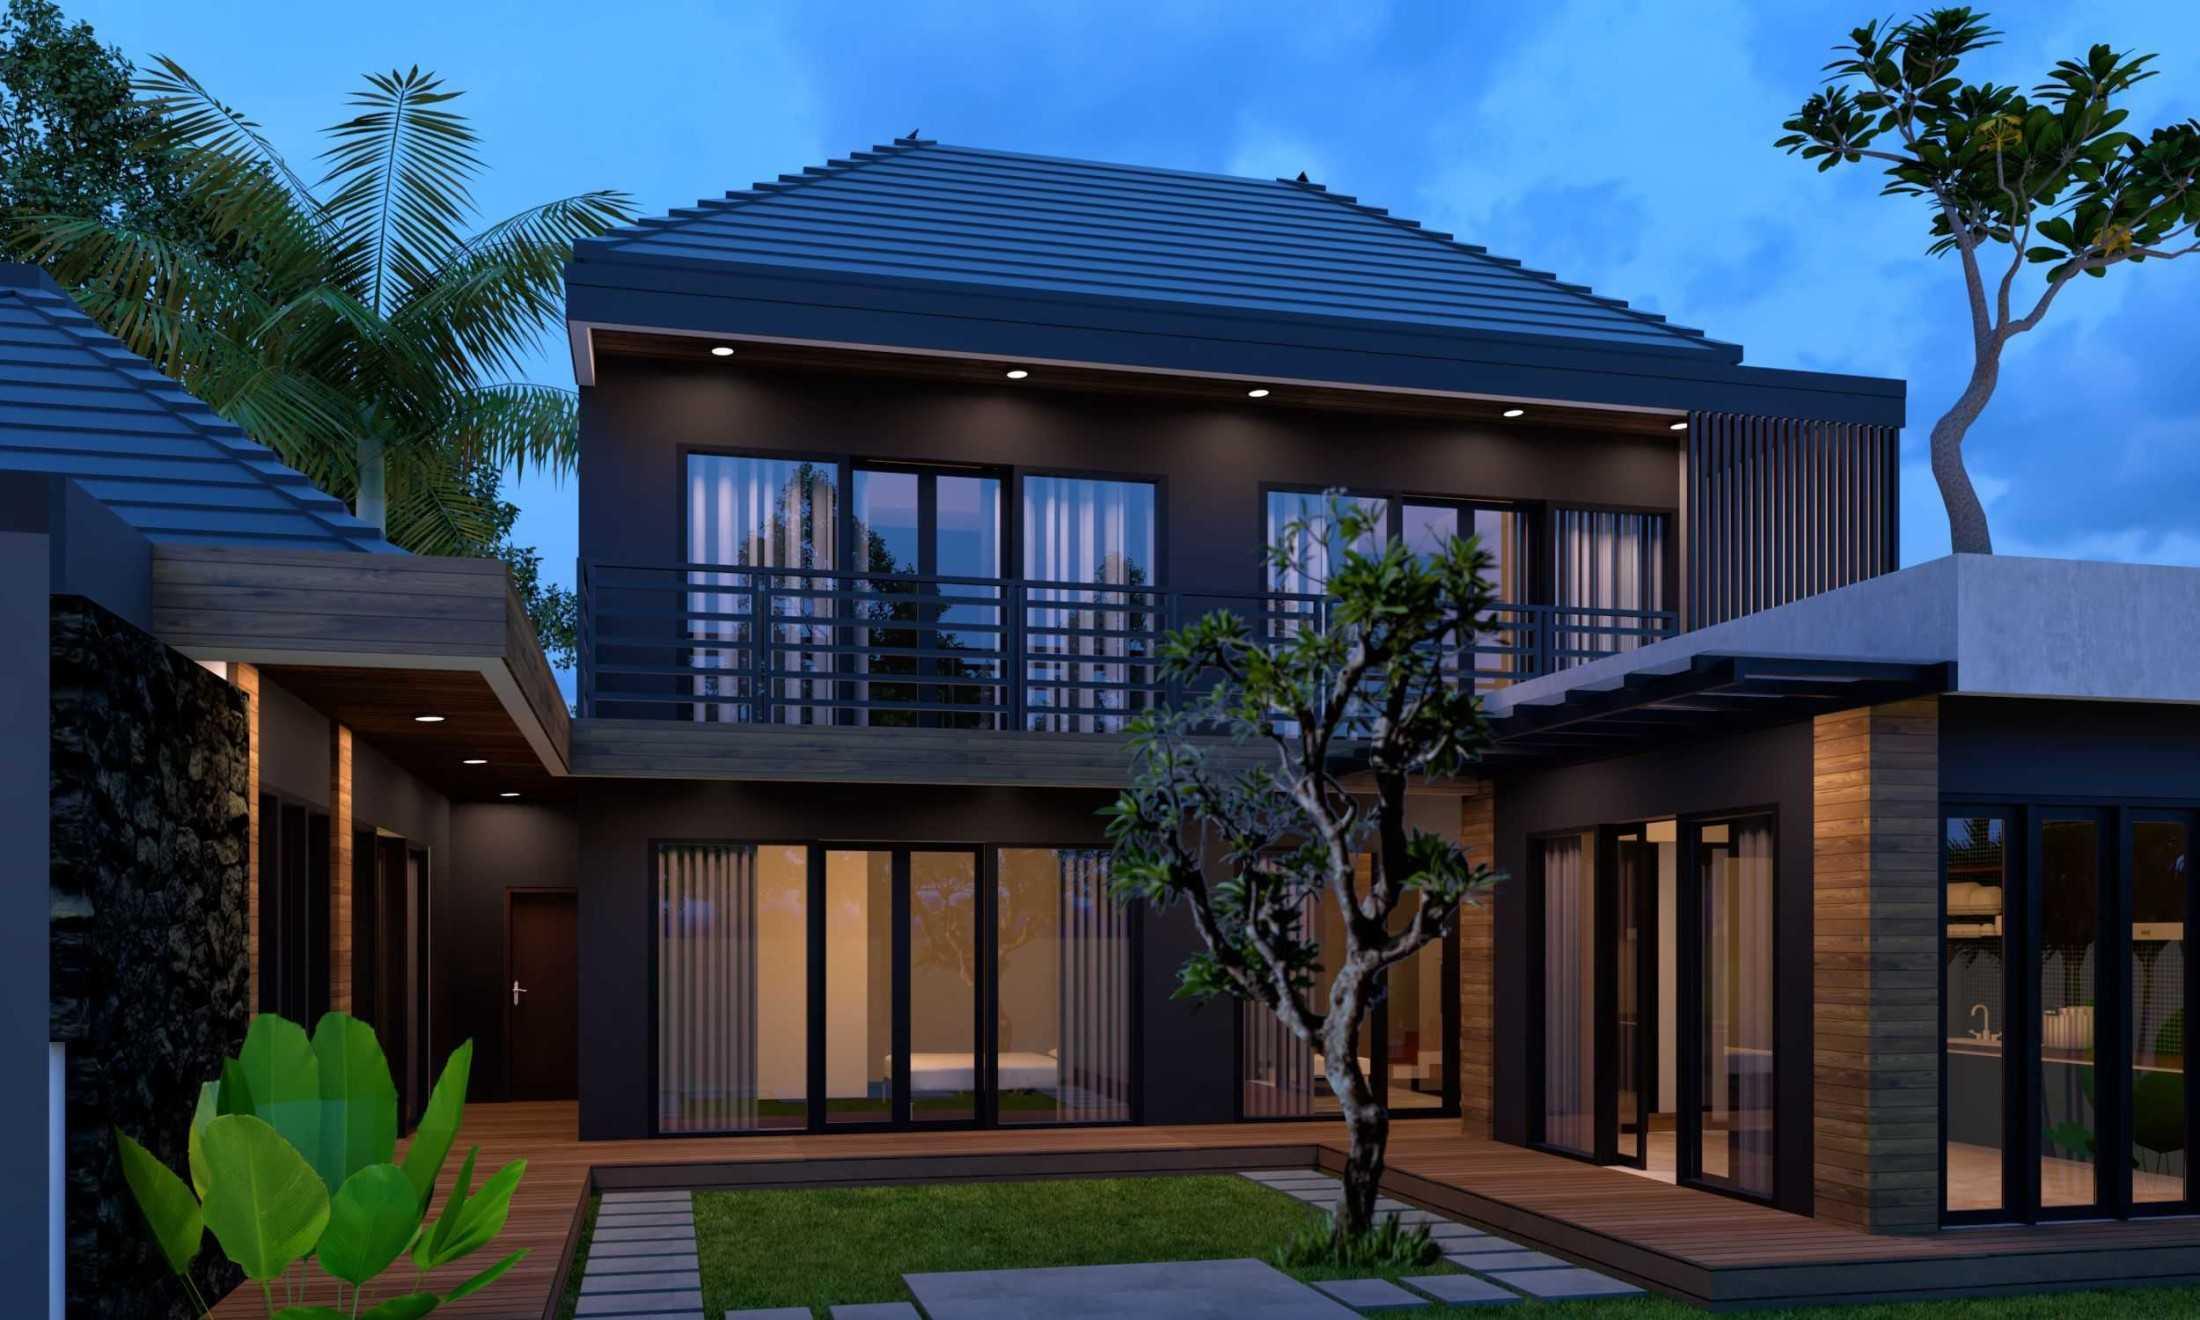 Niara Space The Black House Ubud, Kecamatan Ubud, Kabupaten Gianyar, Bali, Indonesia Ubud, Kecamatan Ubud, Kabupaten Gianyar, Bali, Indonesia Design-8-Studio-The-Black-House Modern 72598